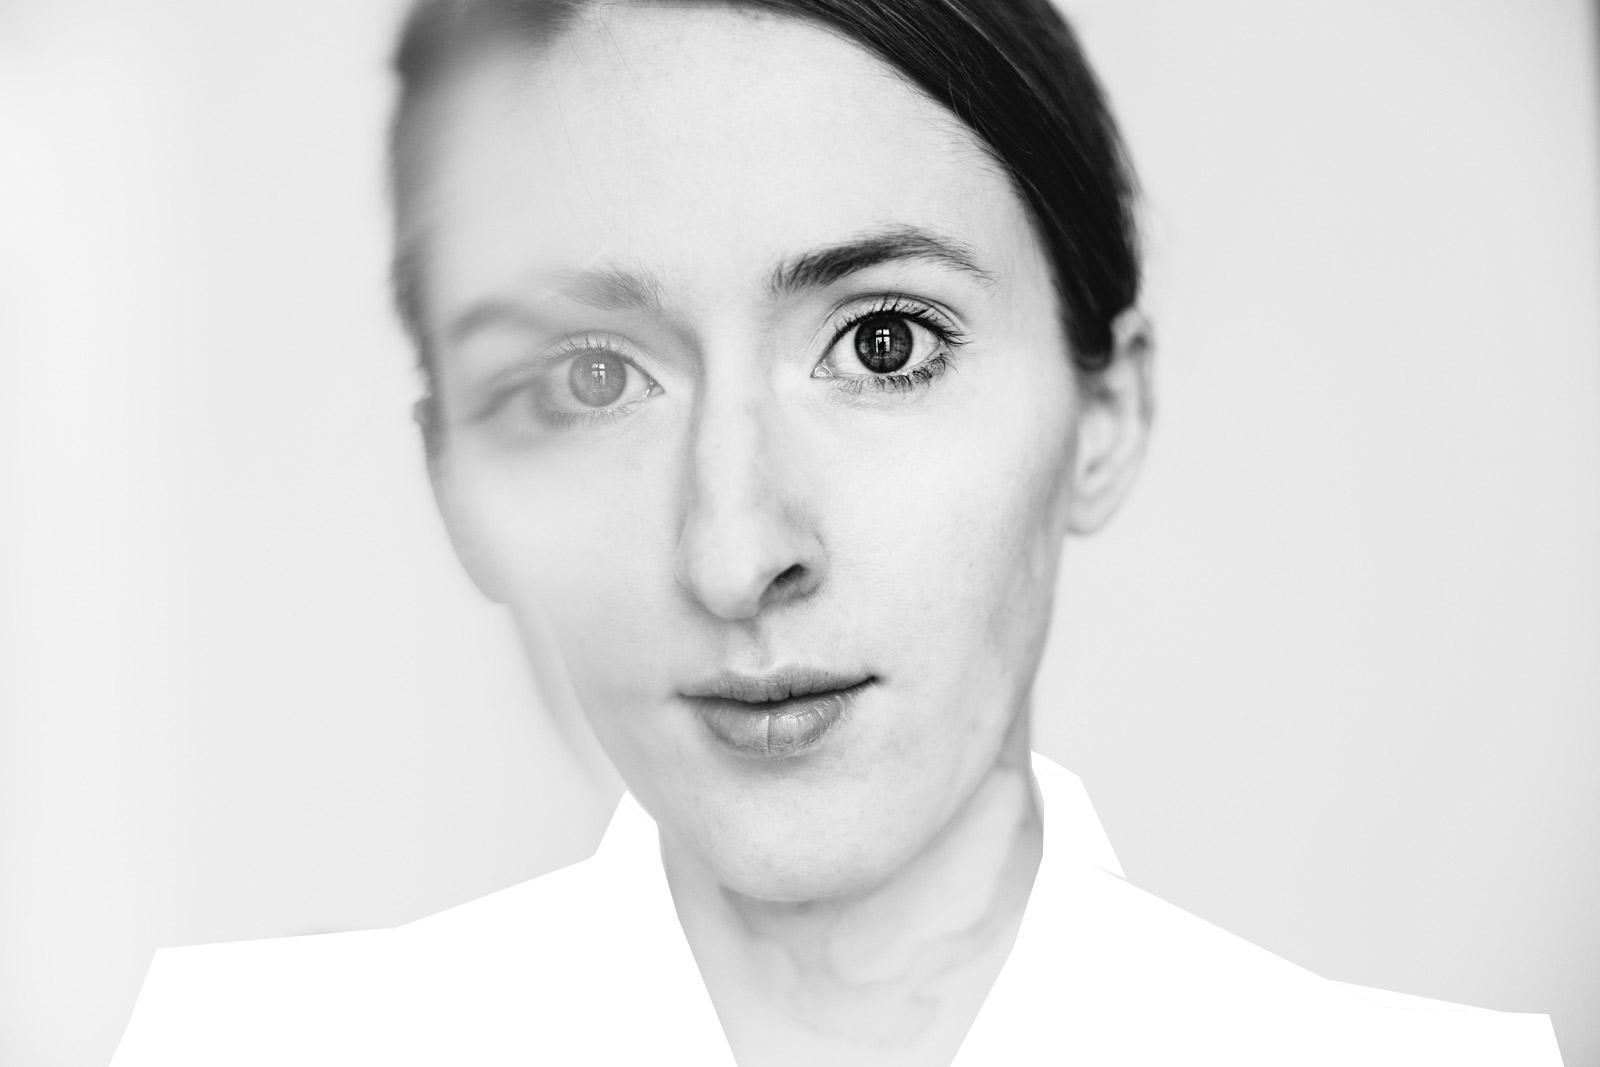 May 2019 Self Portrait